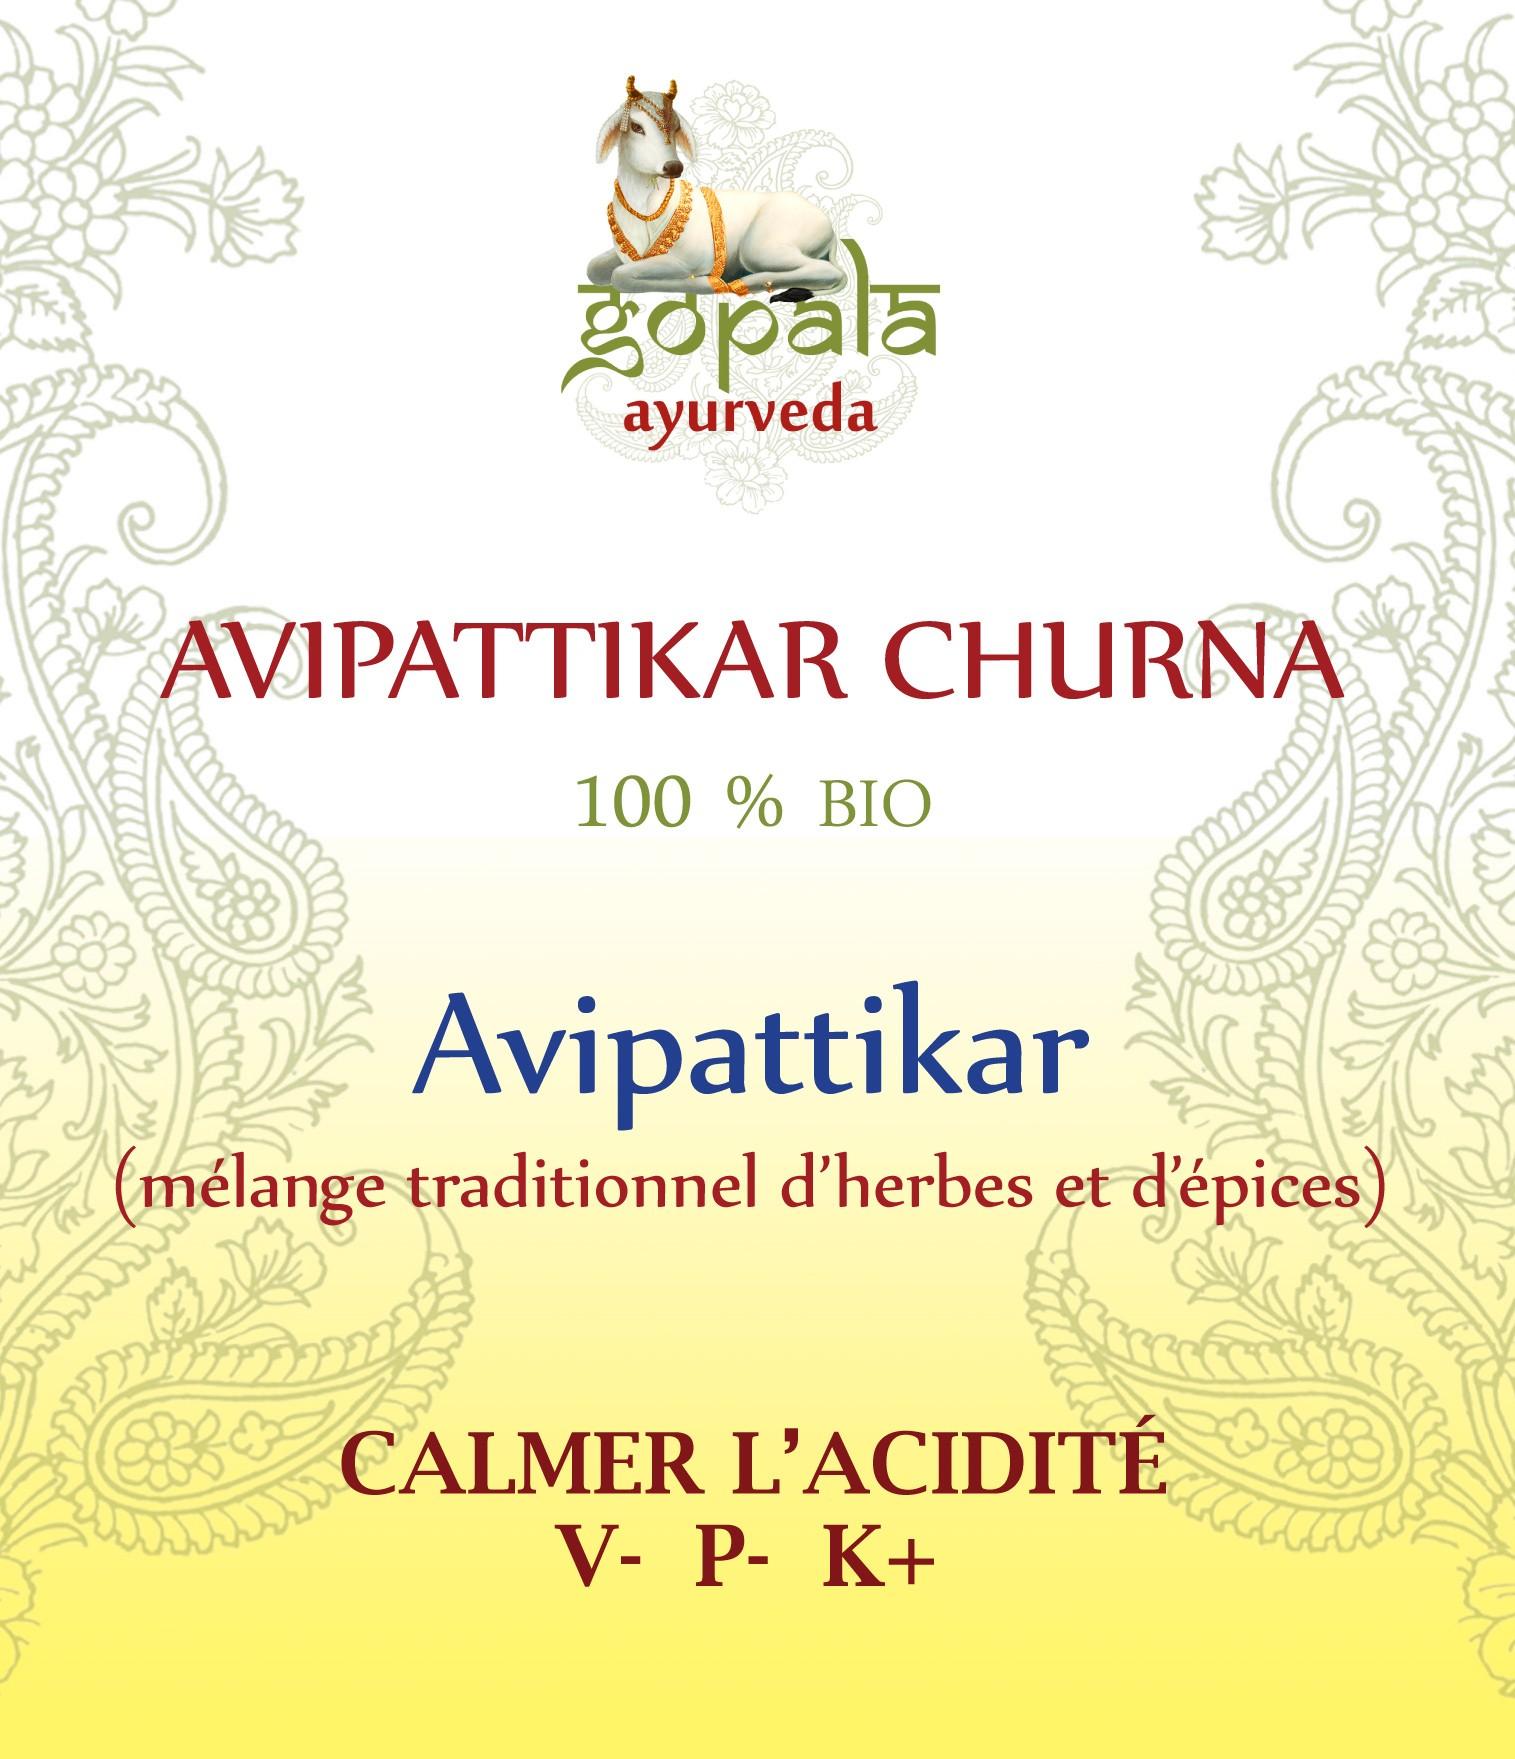 AVIPATTIKAR (formulation traditionnelle) BIO Gopala A.